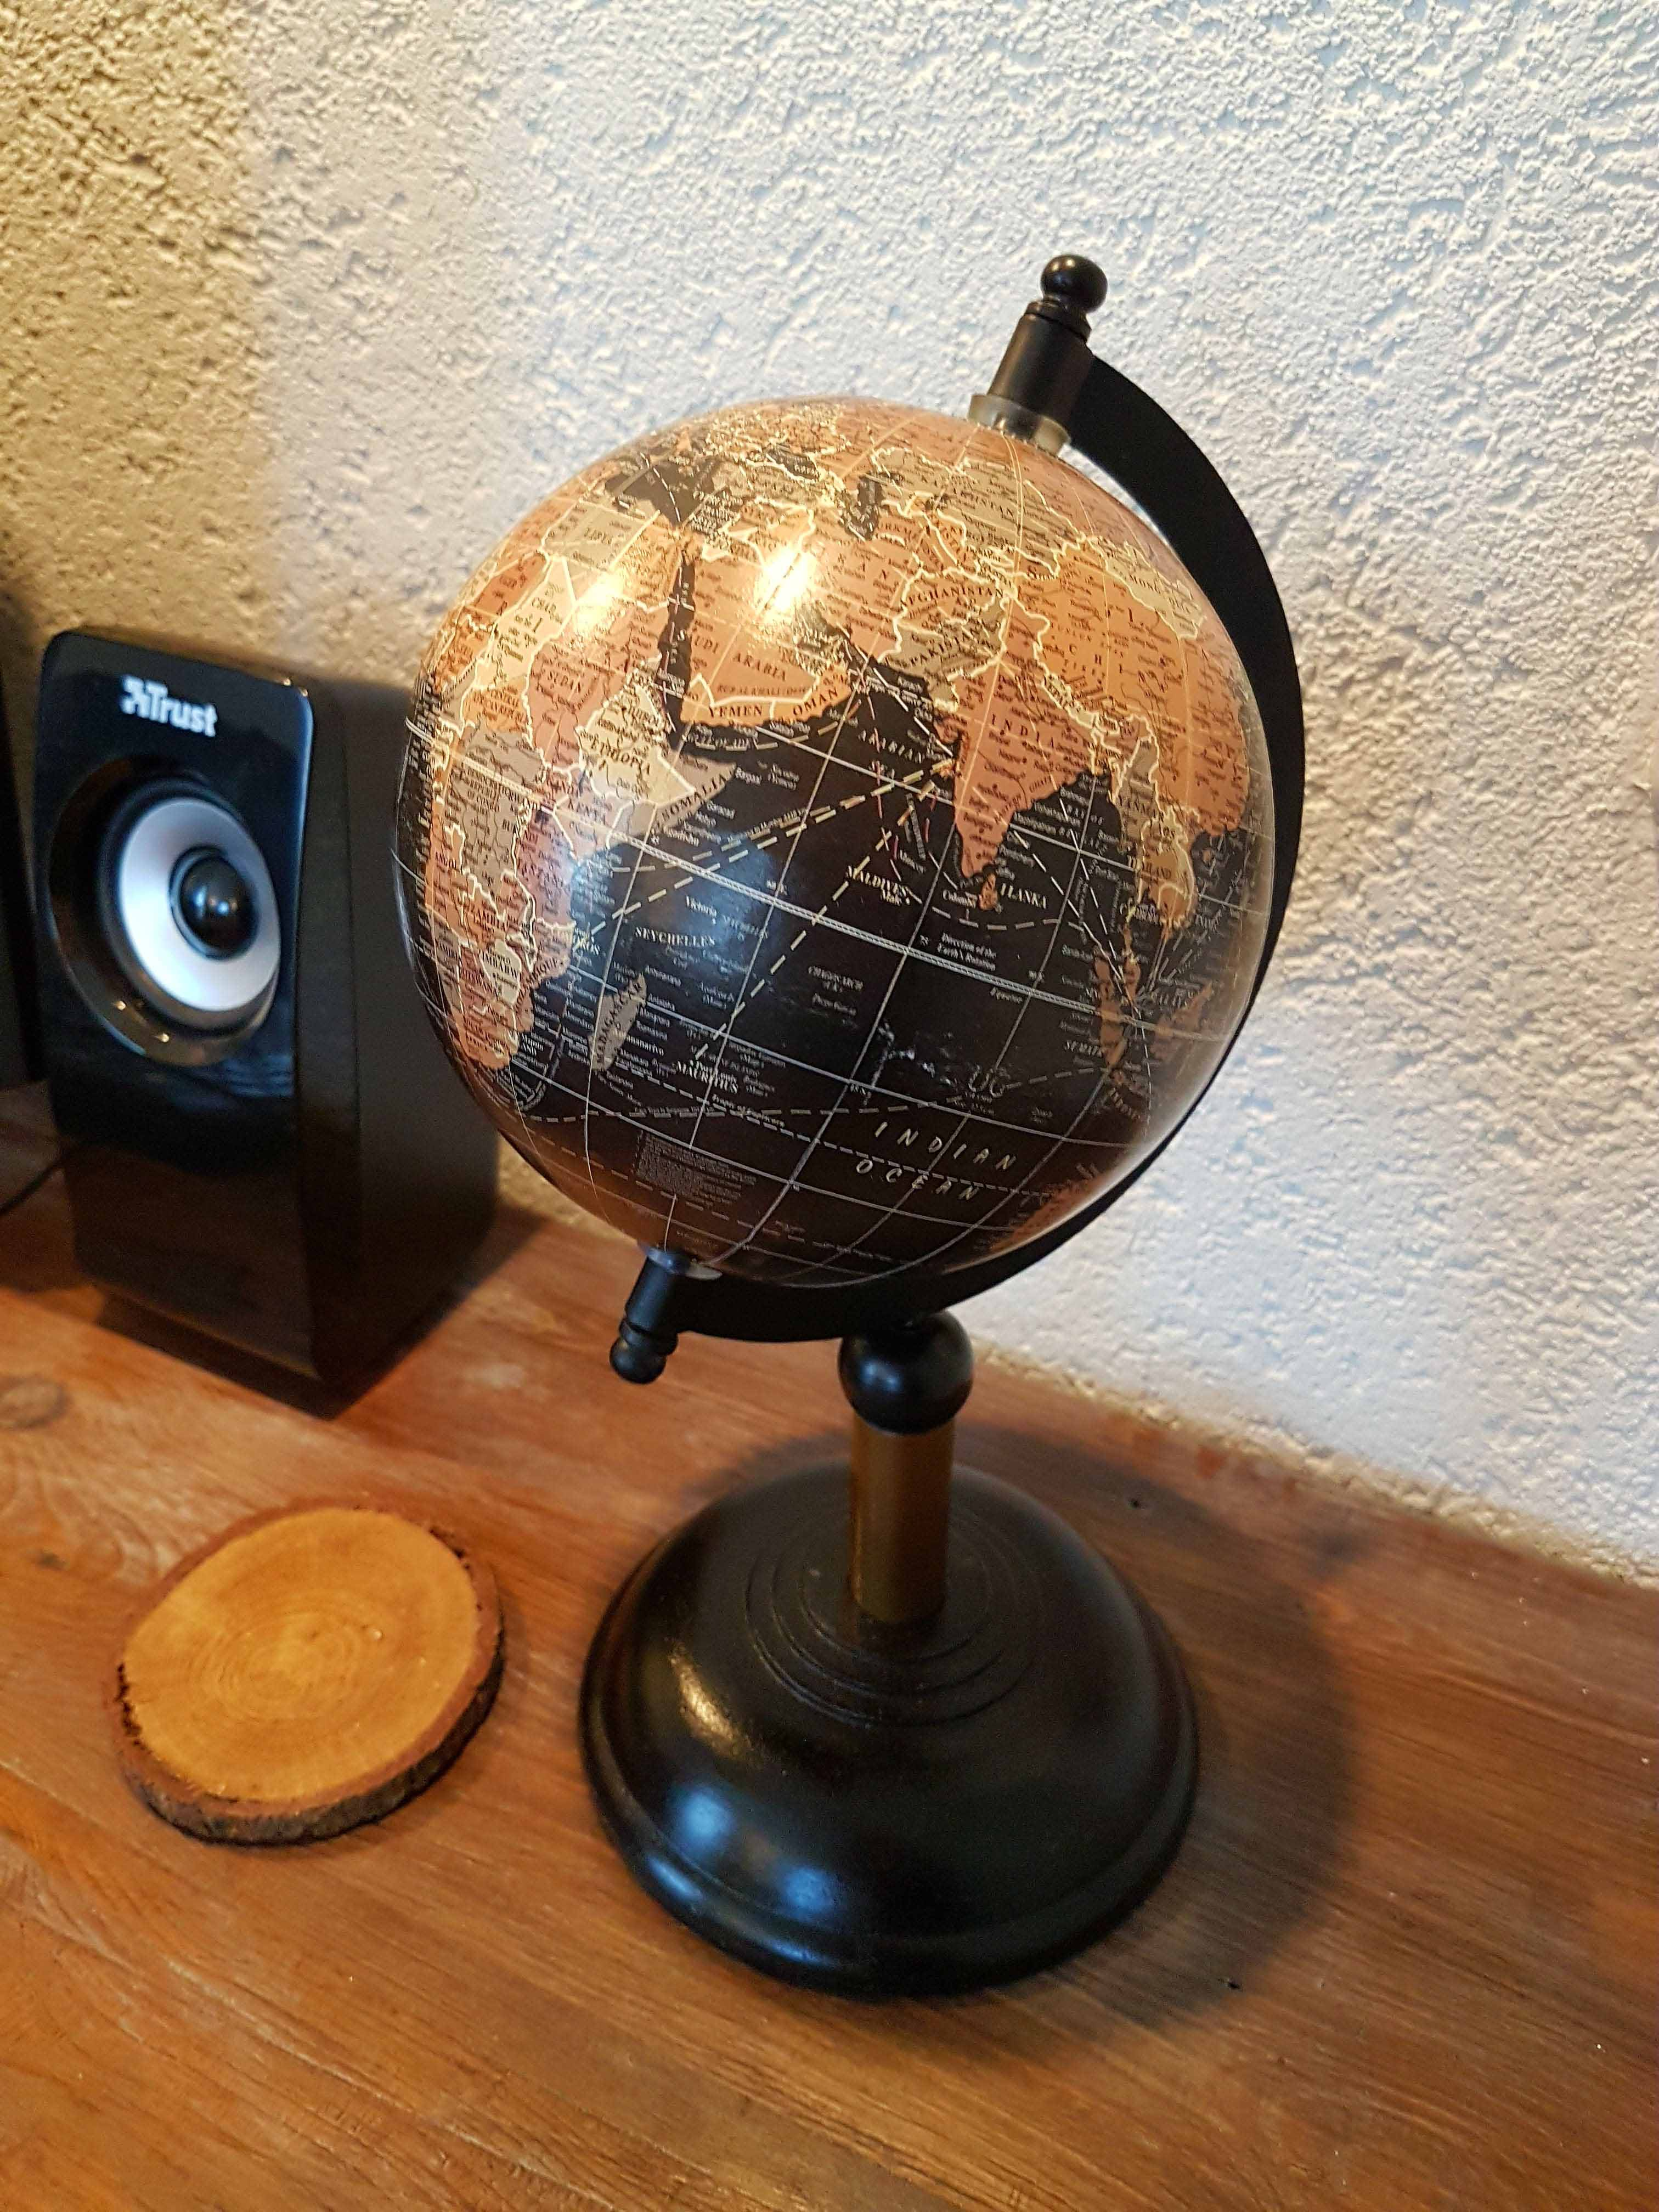 wereldbol als decoratie